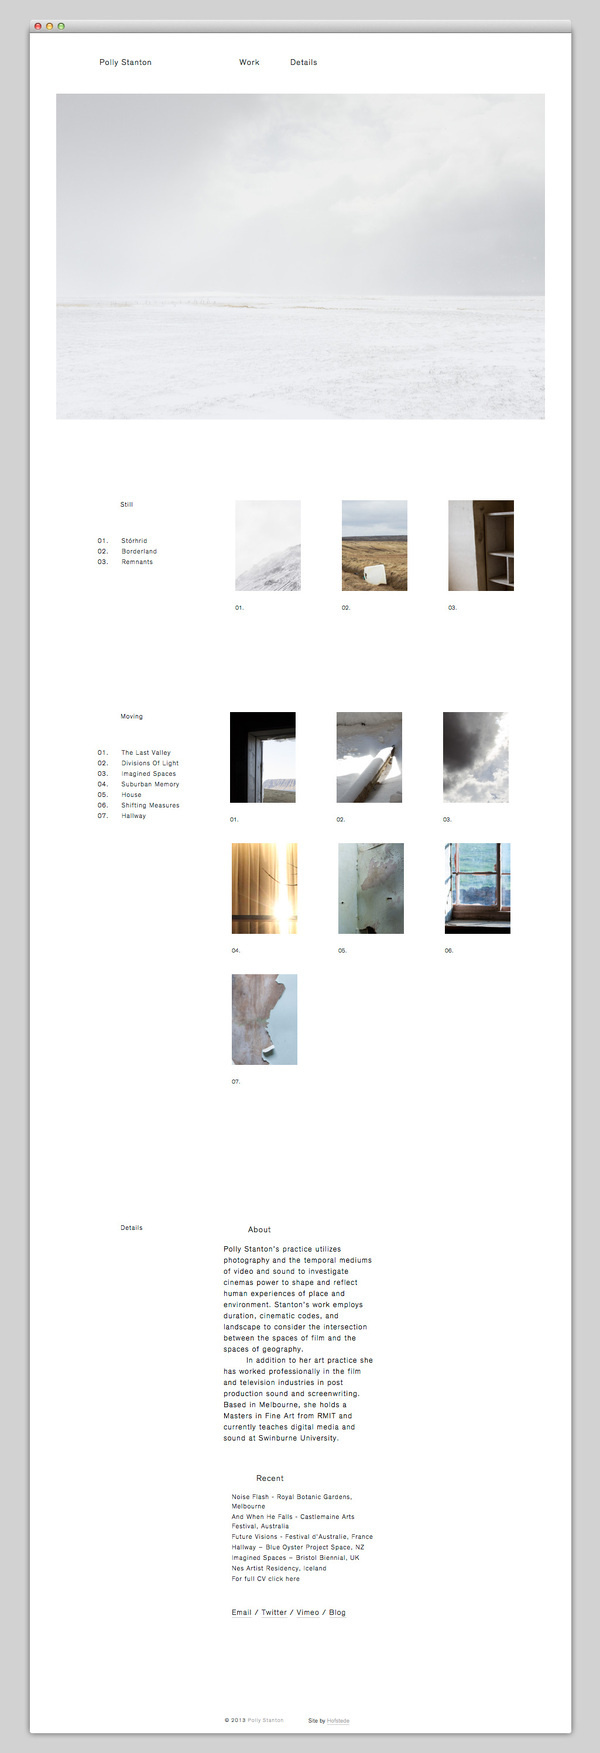 Polly Stanton #website #layout #design #web